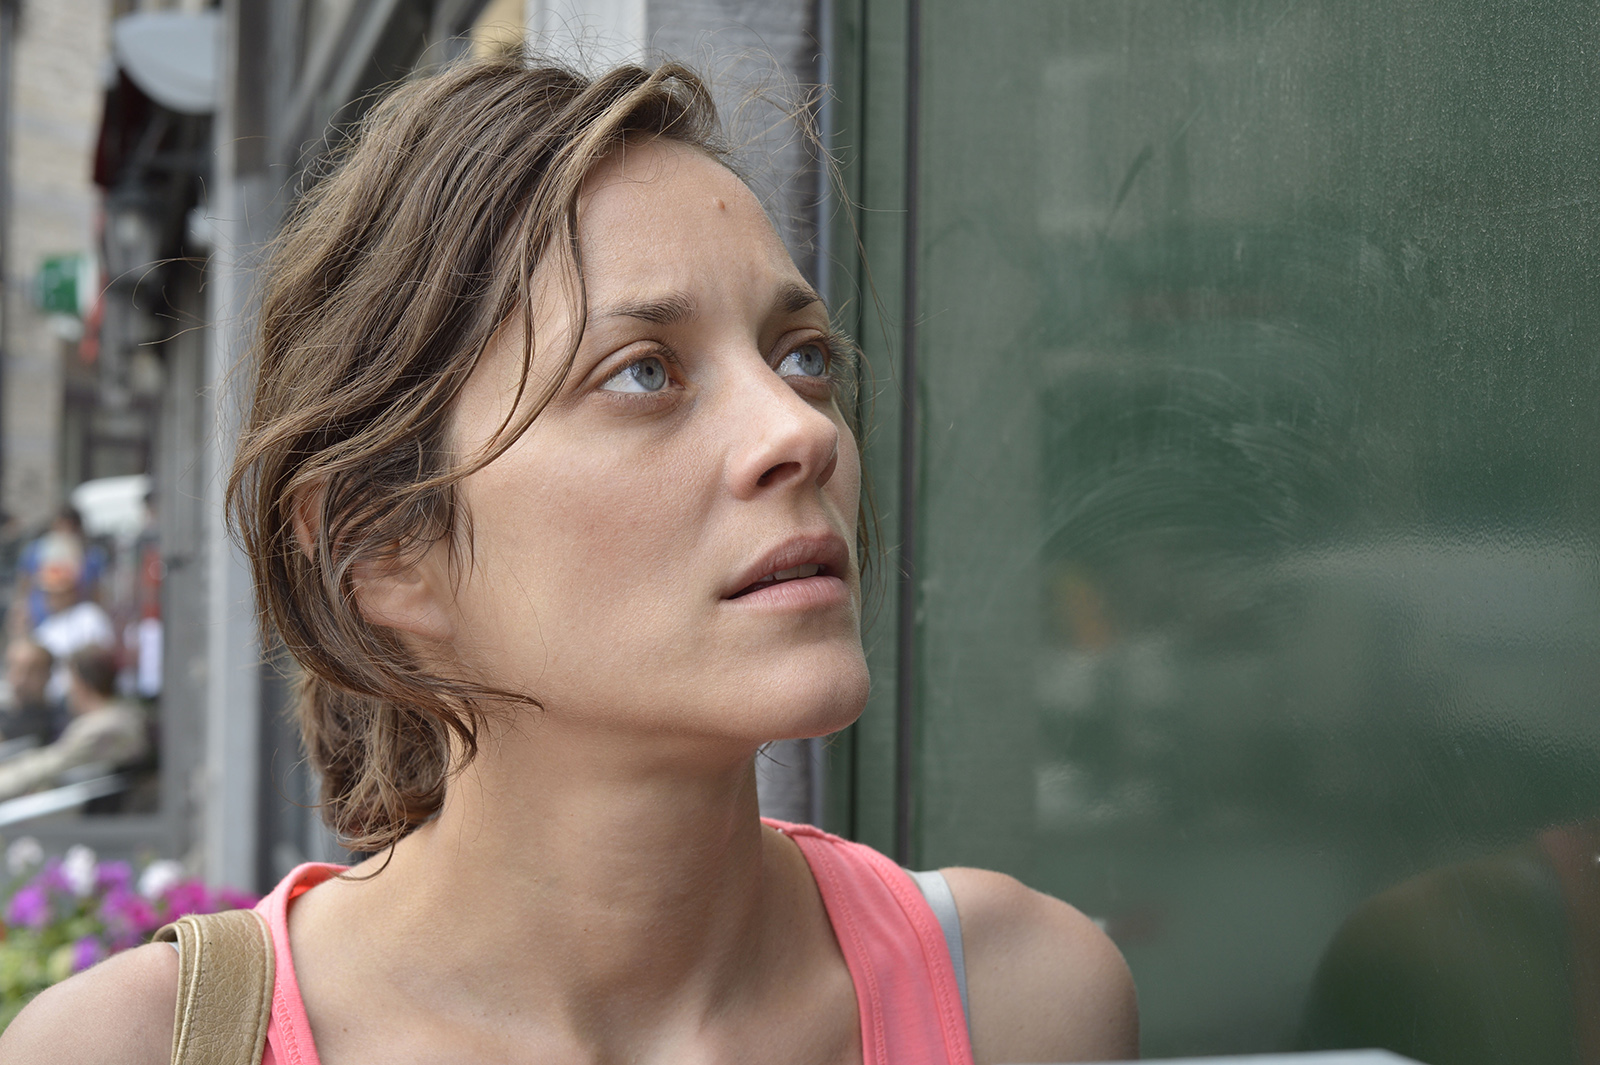 Cronica de film: Marion Cotillard joaca un rol coplesitor in filmul Deux jours, une nuit